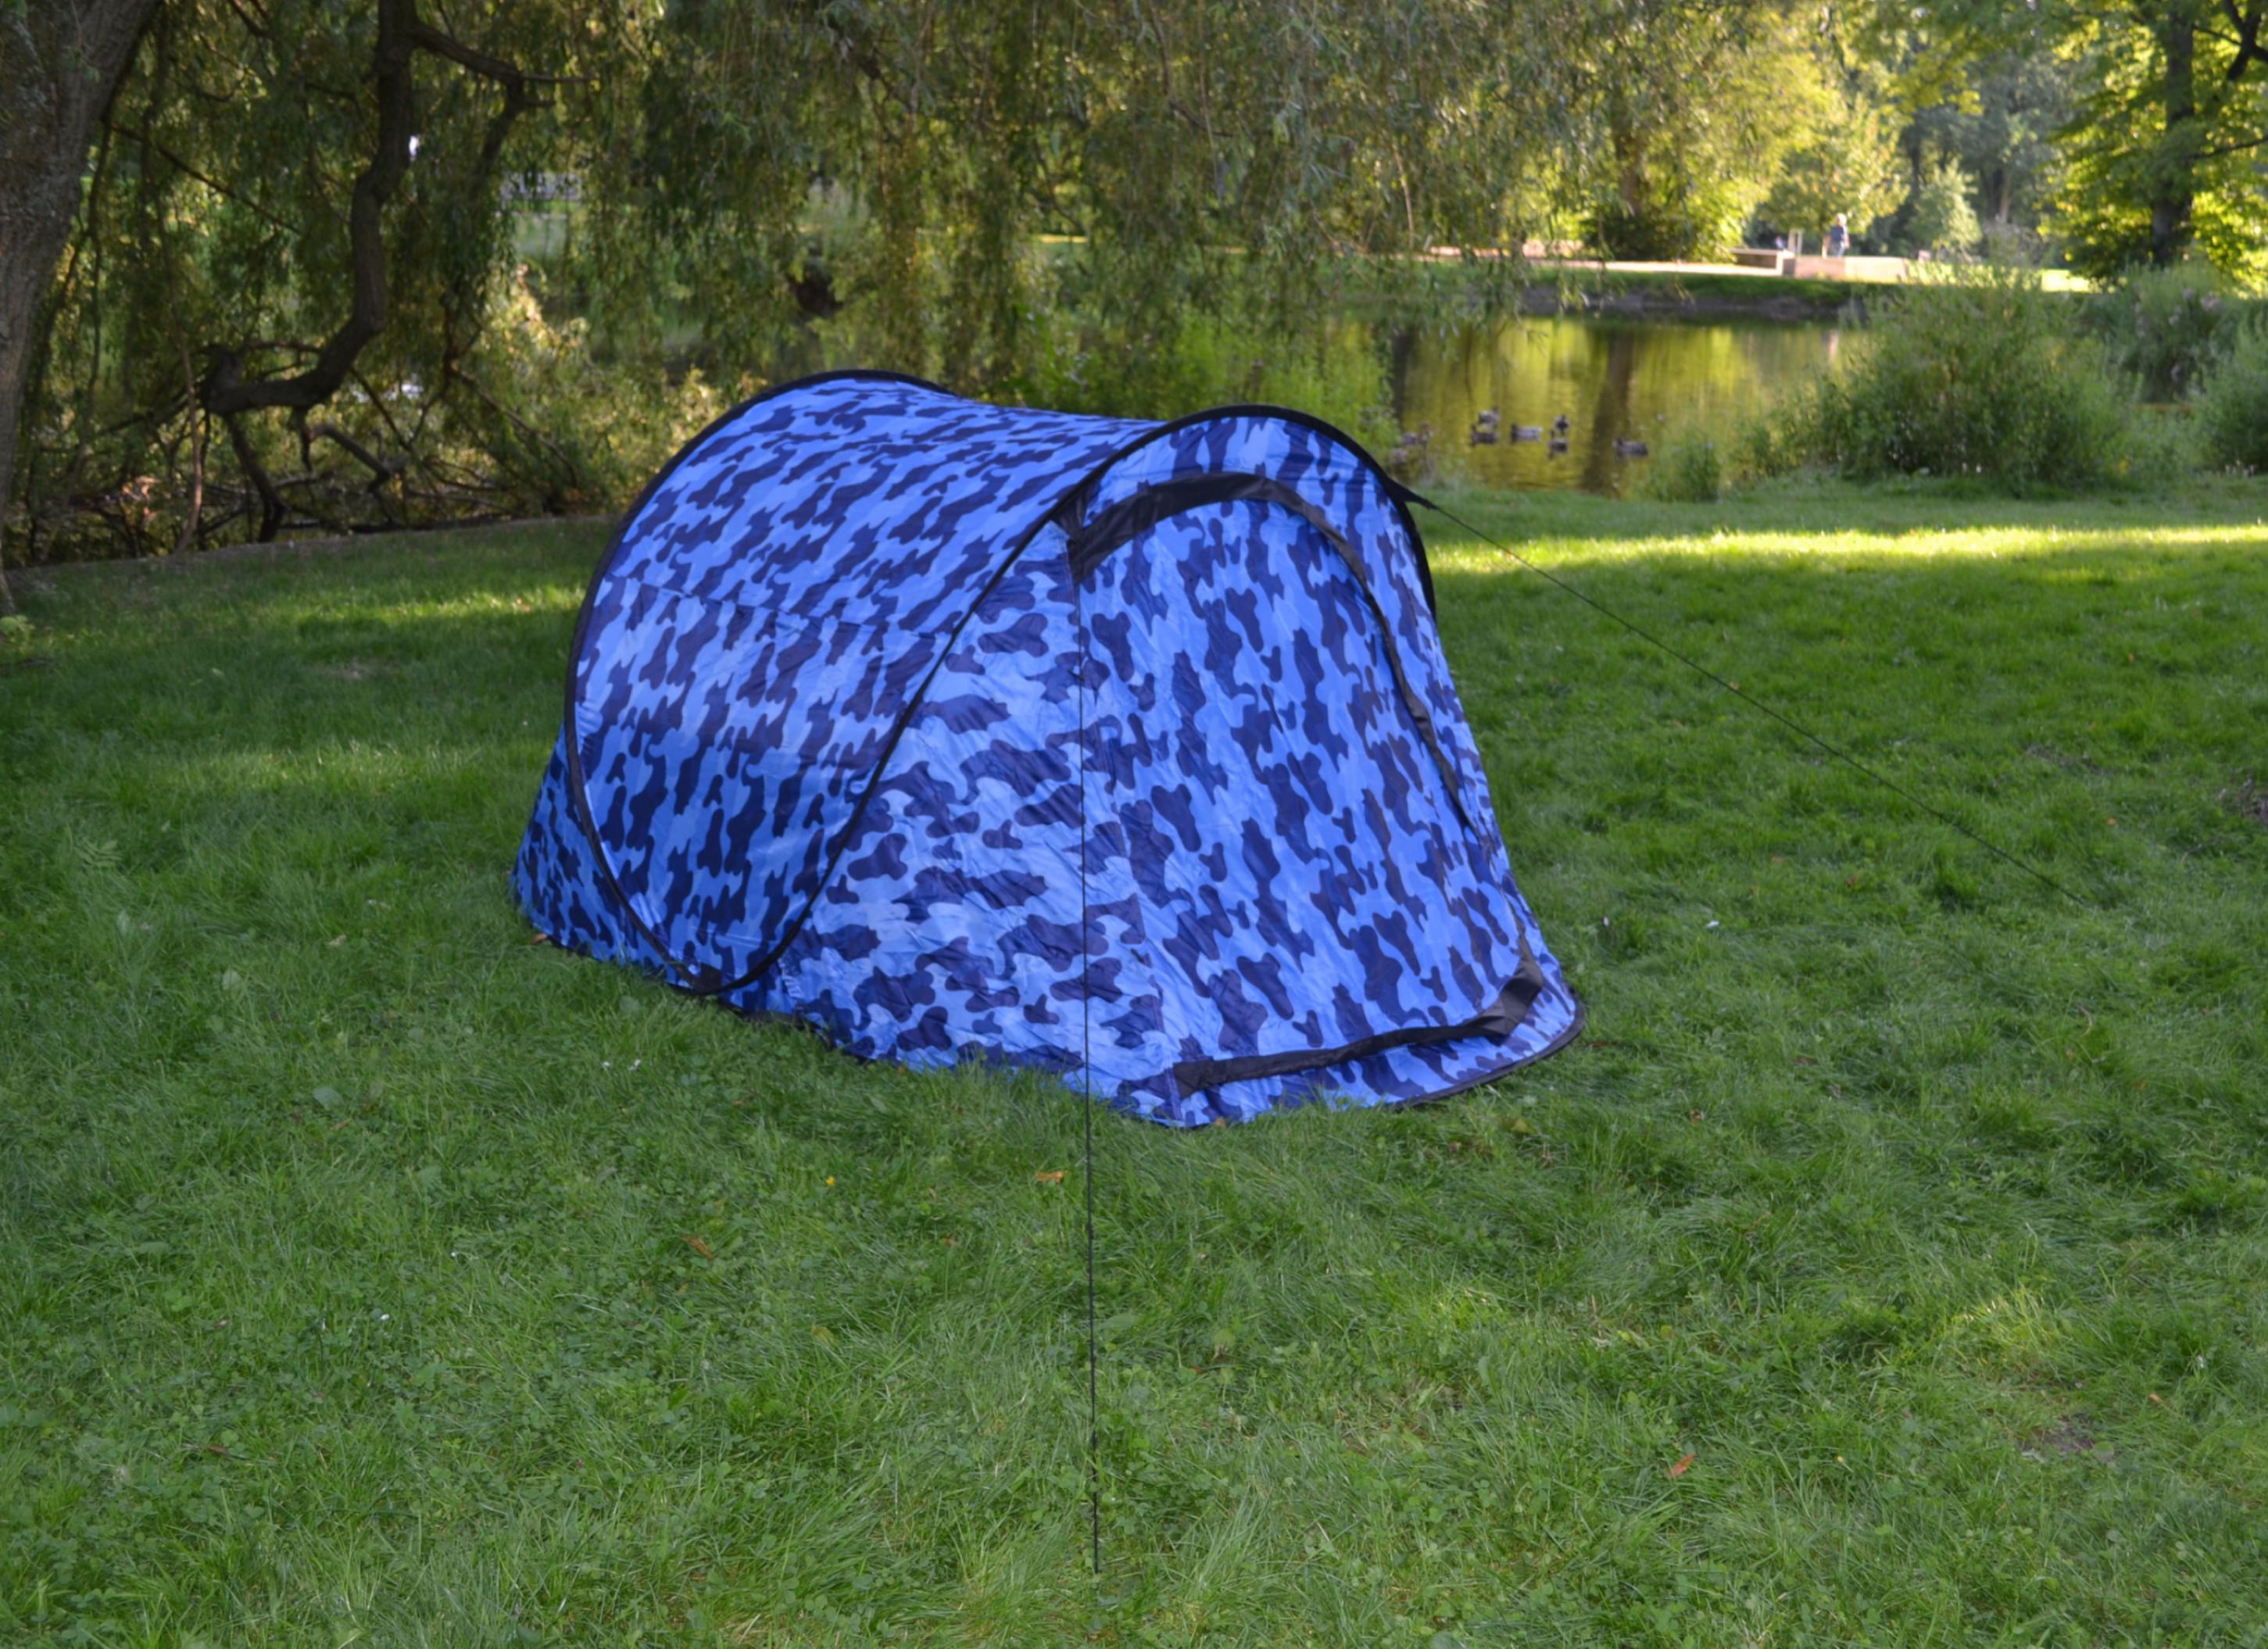 Wurfzelt Sekundenzelt 2-3 Person Outdoor Campingzelt Tent Pop Up 245x145x110cm BLAU-Camouflage